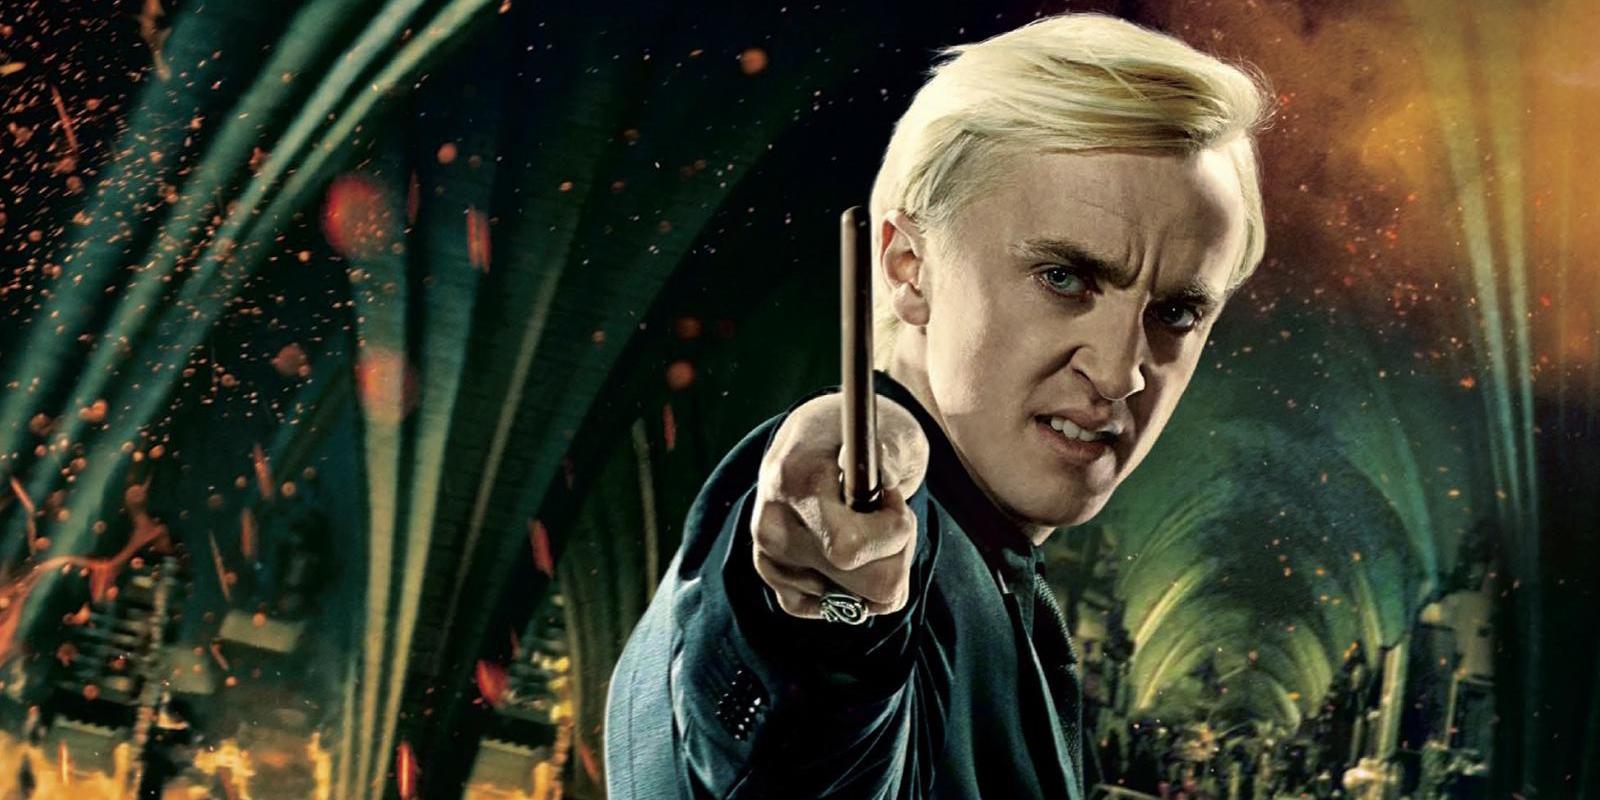 Harry Potter Tom Felton Interested In Reprising Draco